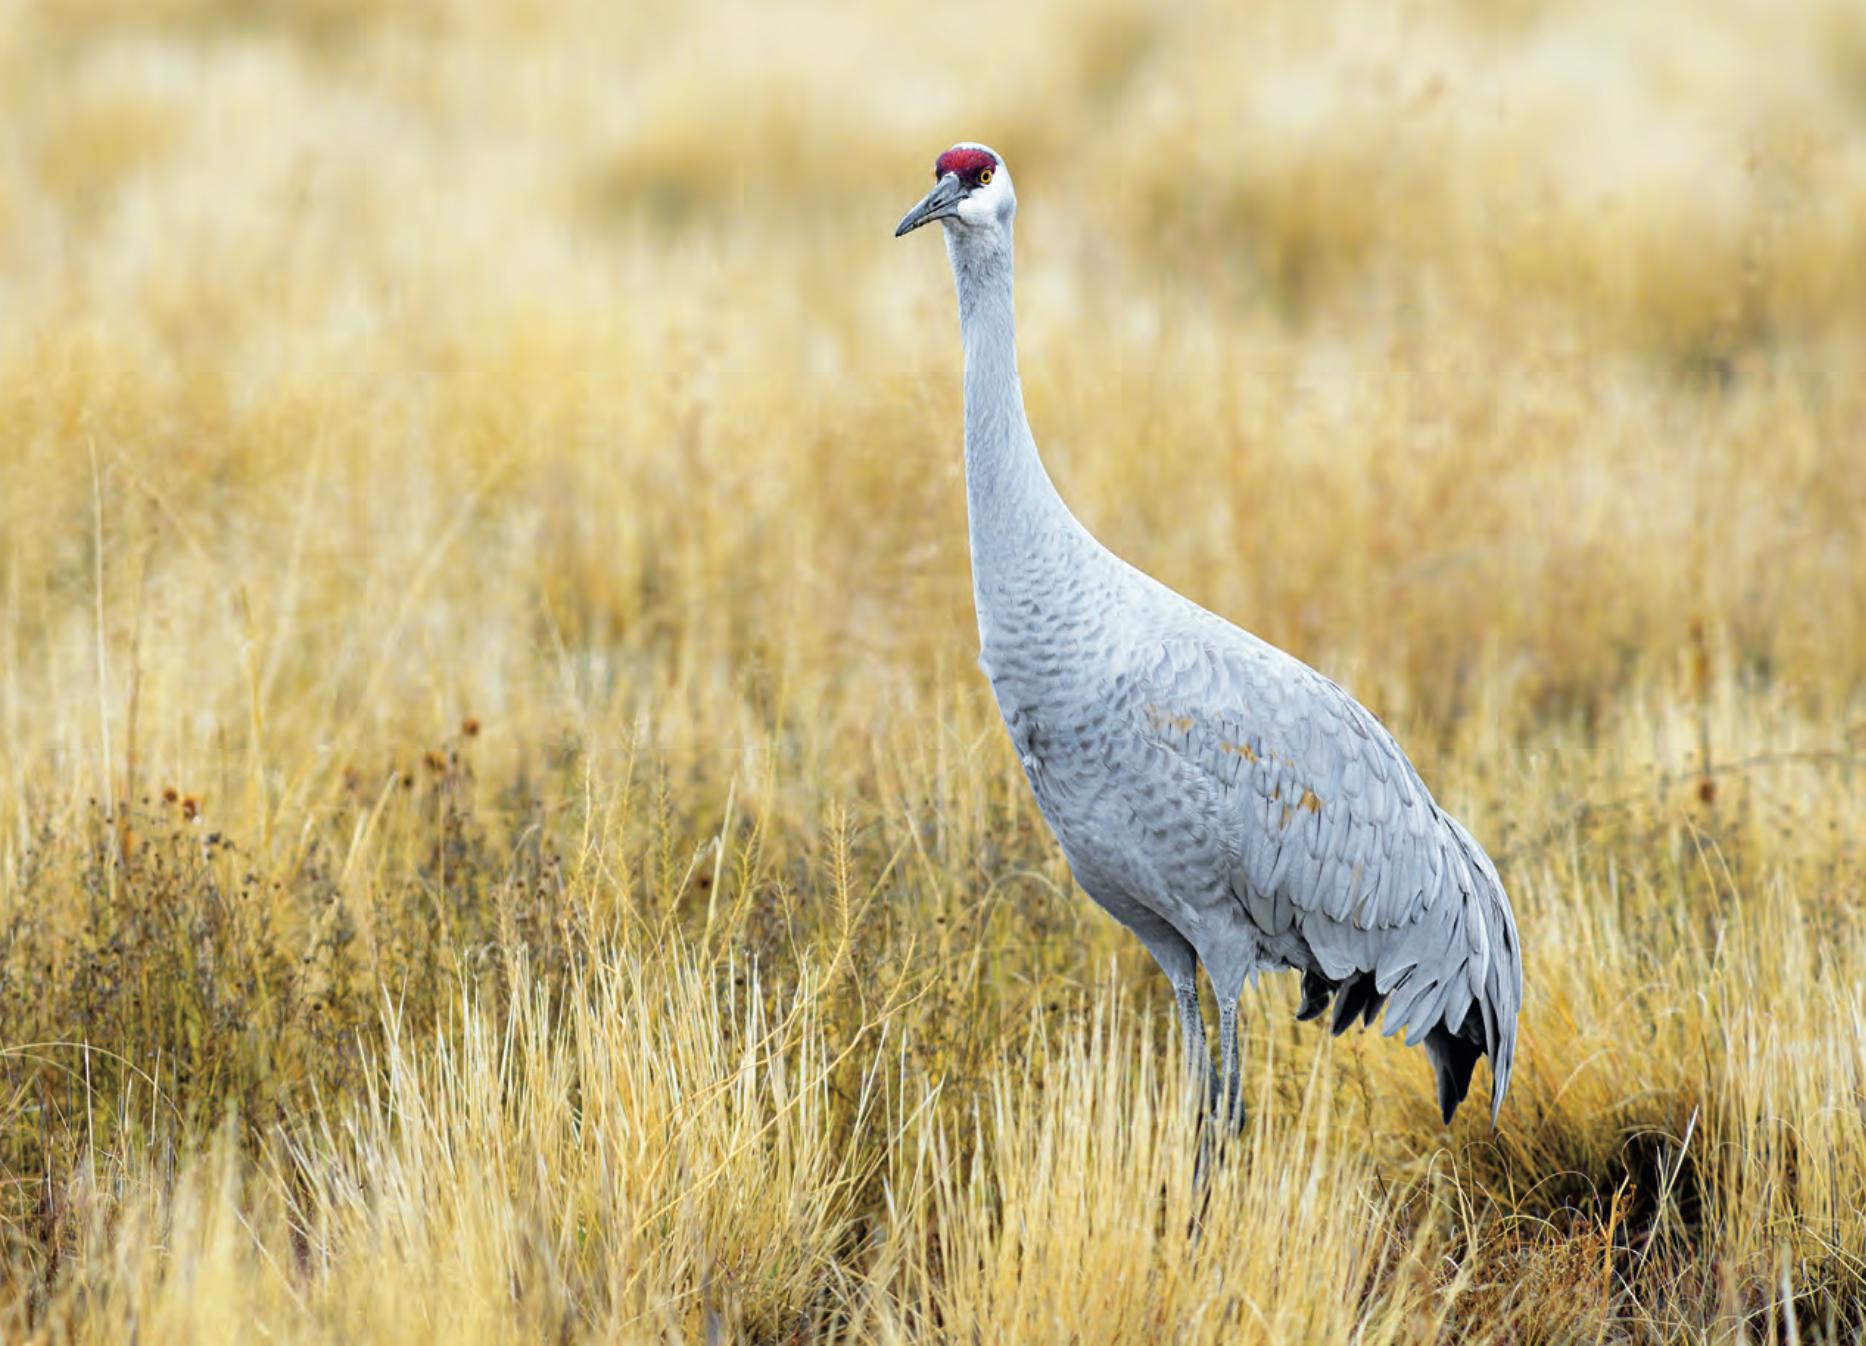 Sandhill Crane Hunting Tips and Tactics